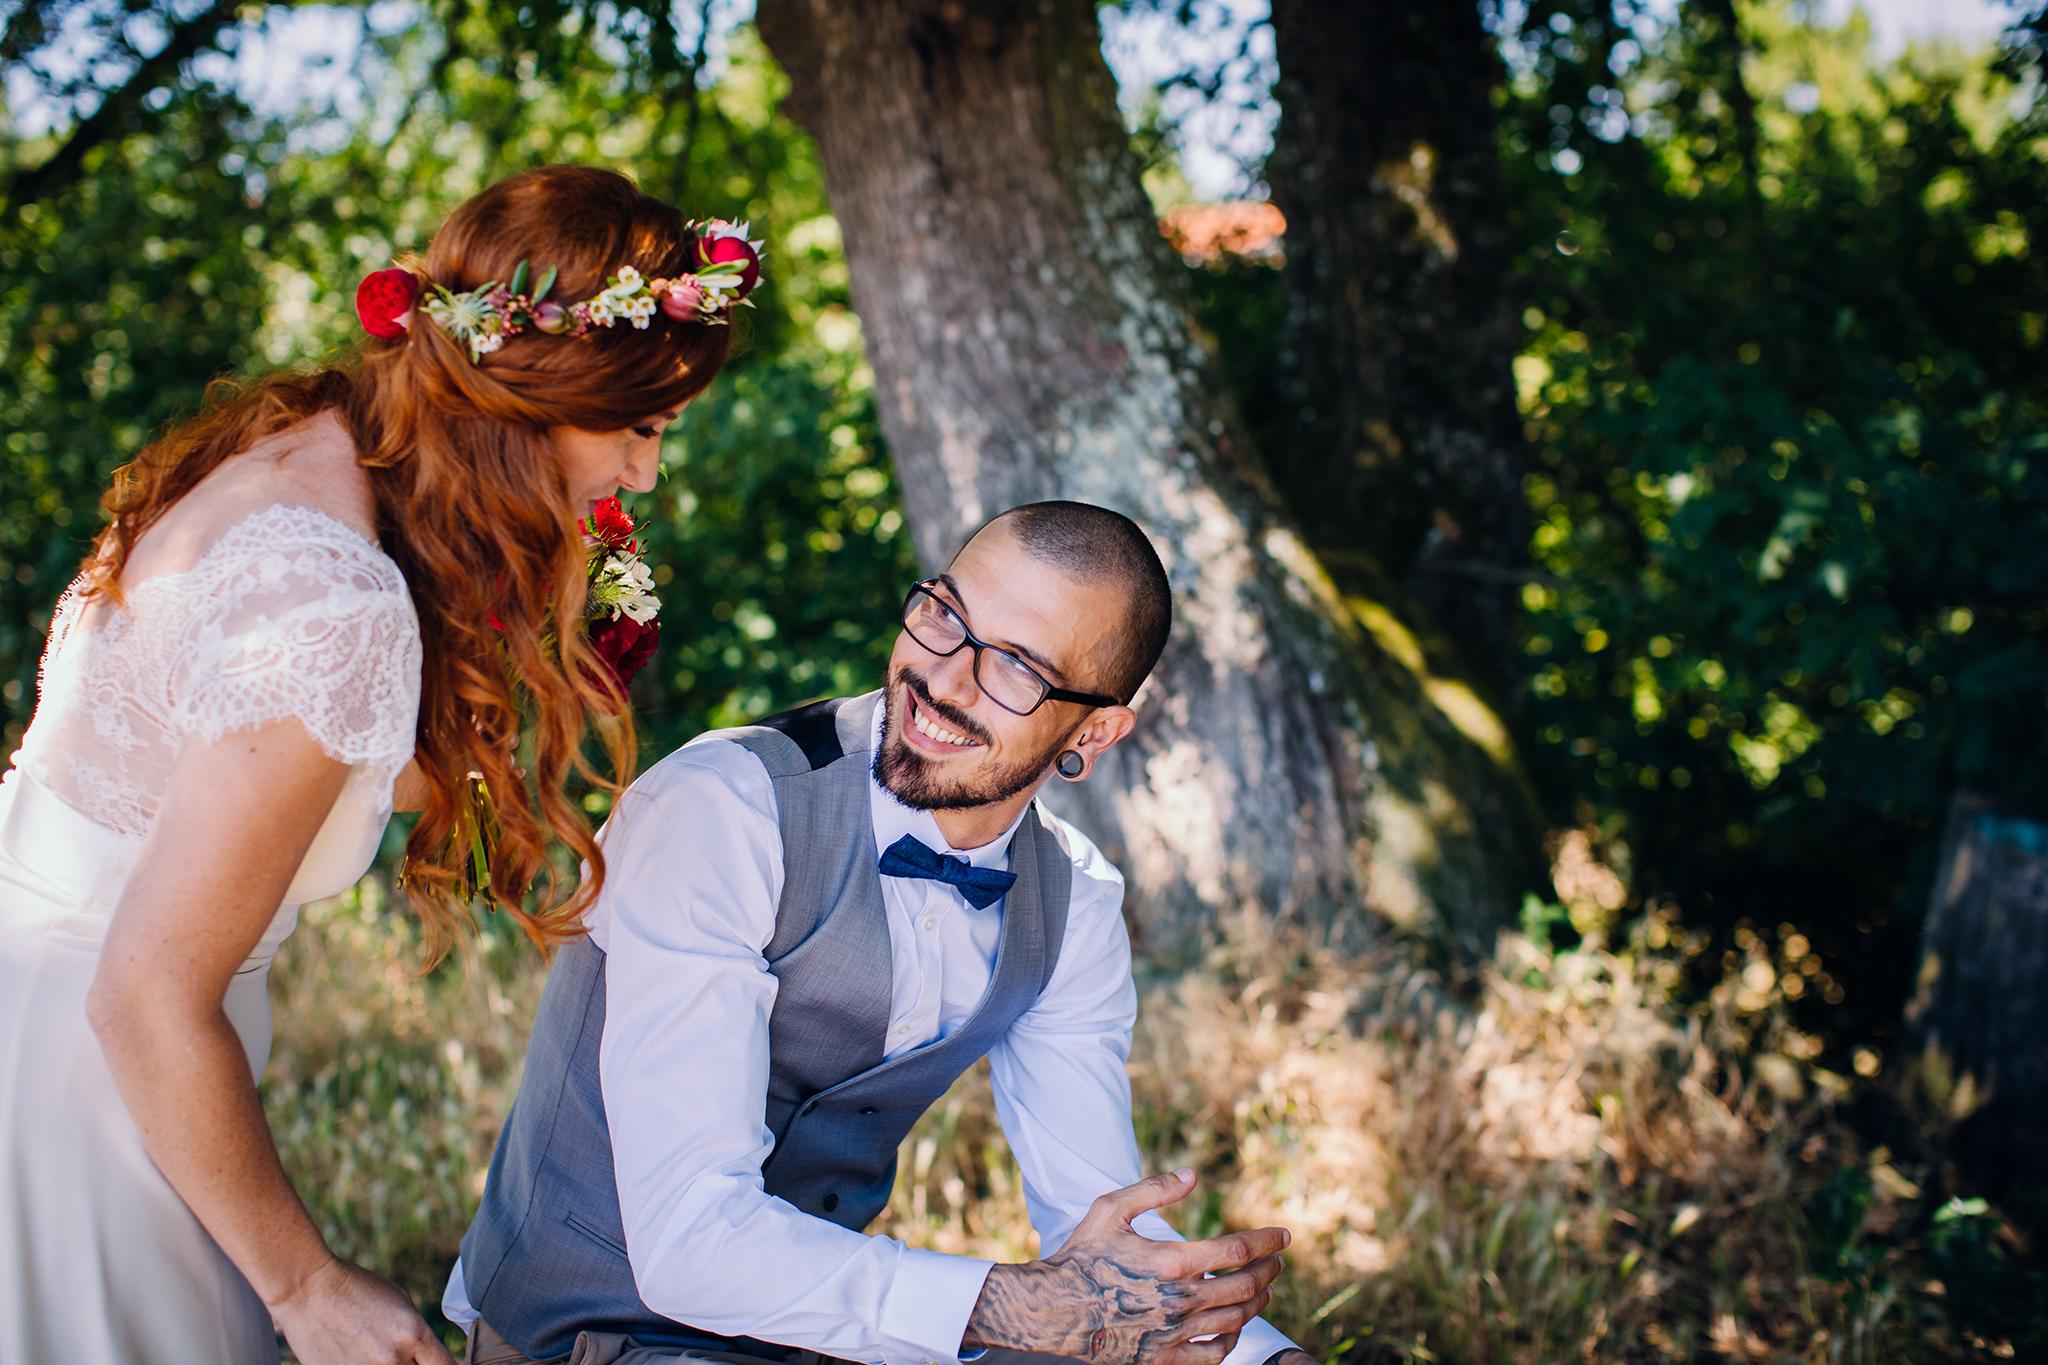 photographe-mariage-toulouse-rocknroll-maries-tatoues-floriane-caux-18